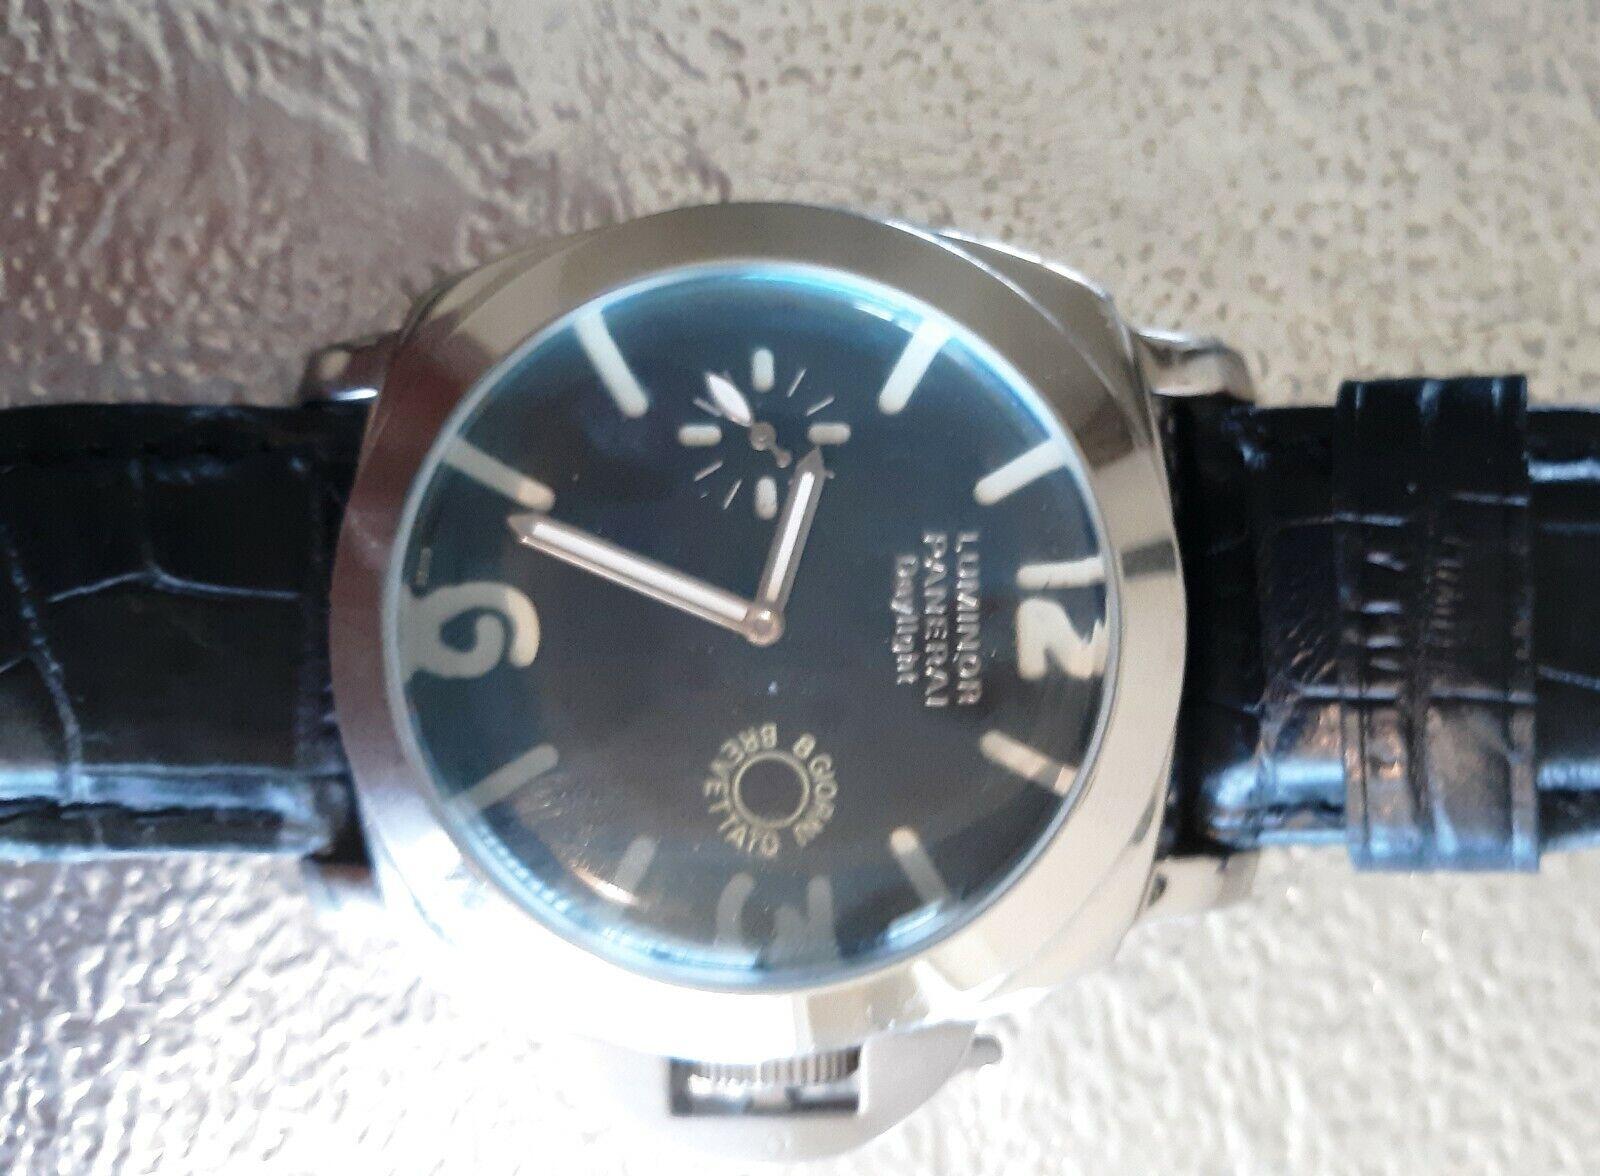 """PANERAI LUMINOR DAYLIGHT STAINLESS STEEL AUTOMATIC MEN WATCH"" - watch picture 1"